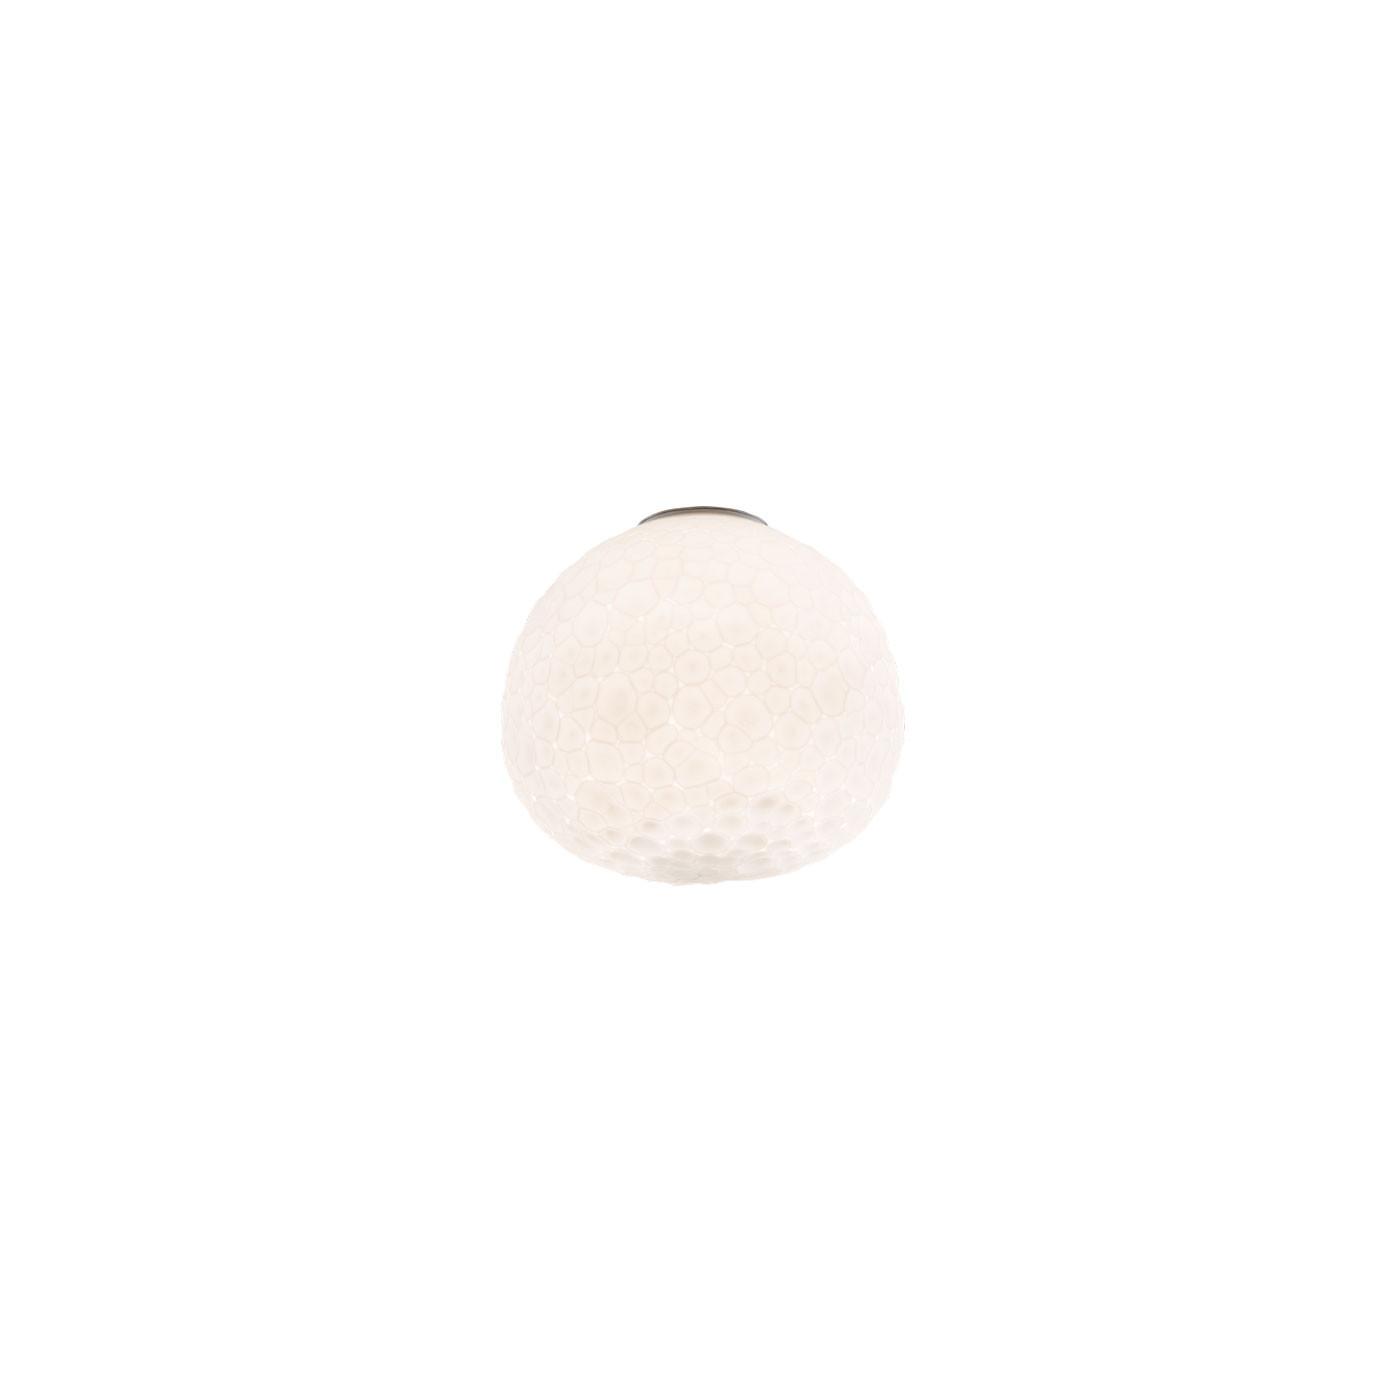 Artemide Meteorite Parete / Soffitto